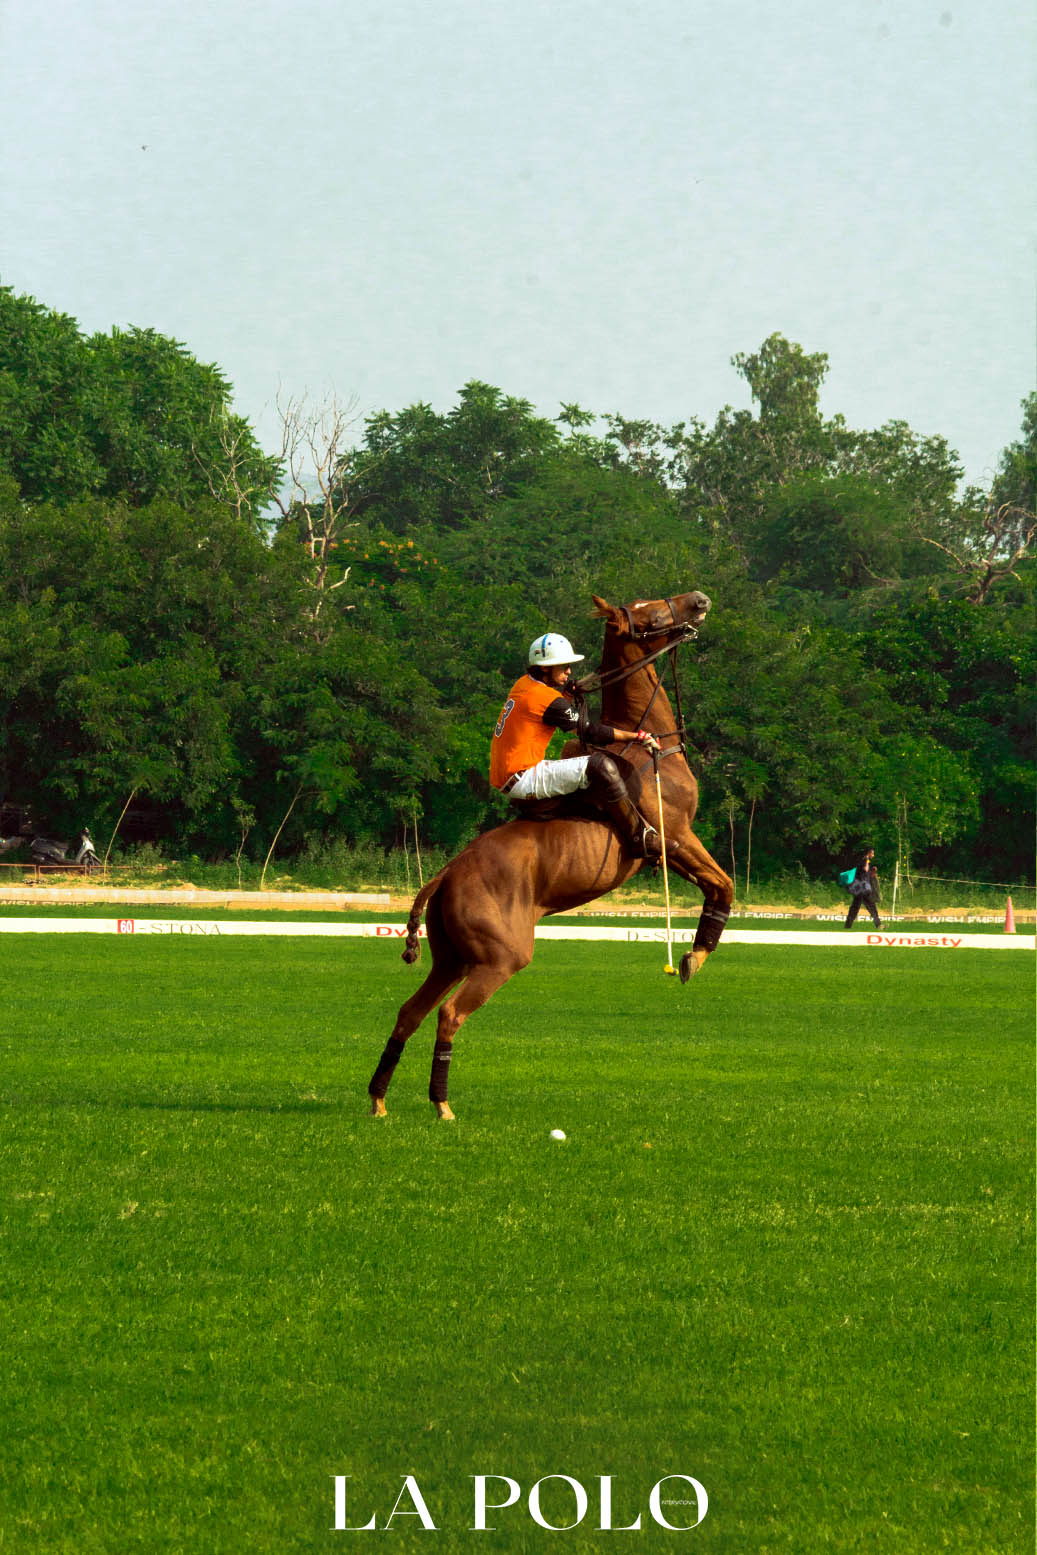 Sunny patel polo player